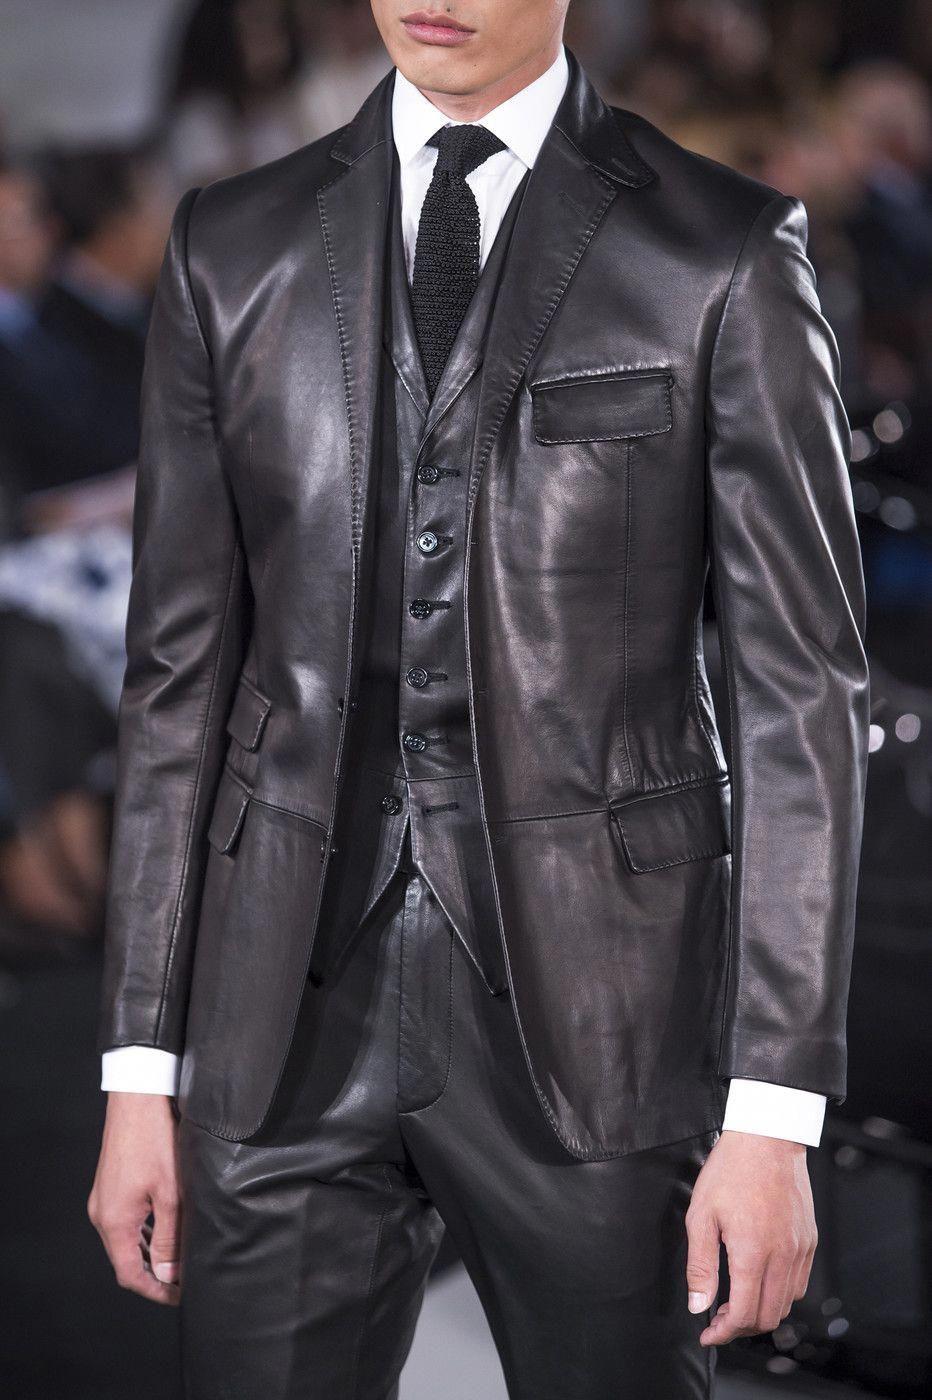 Ralph Lauren At New York Fashion Week Fall 2017 Details Runway Photos Mensfashionclothes Mens Fashion Smart Mens Fashion Suits Jackets Men Fashion